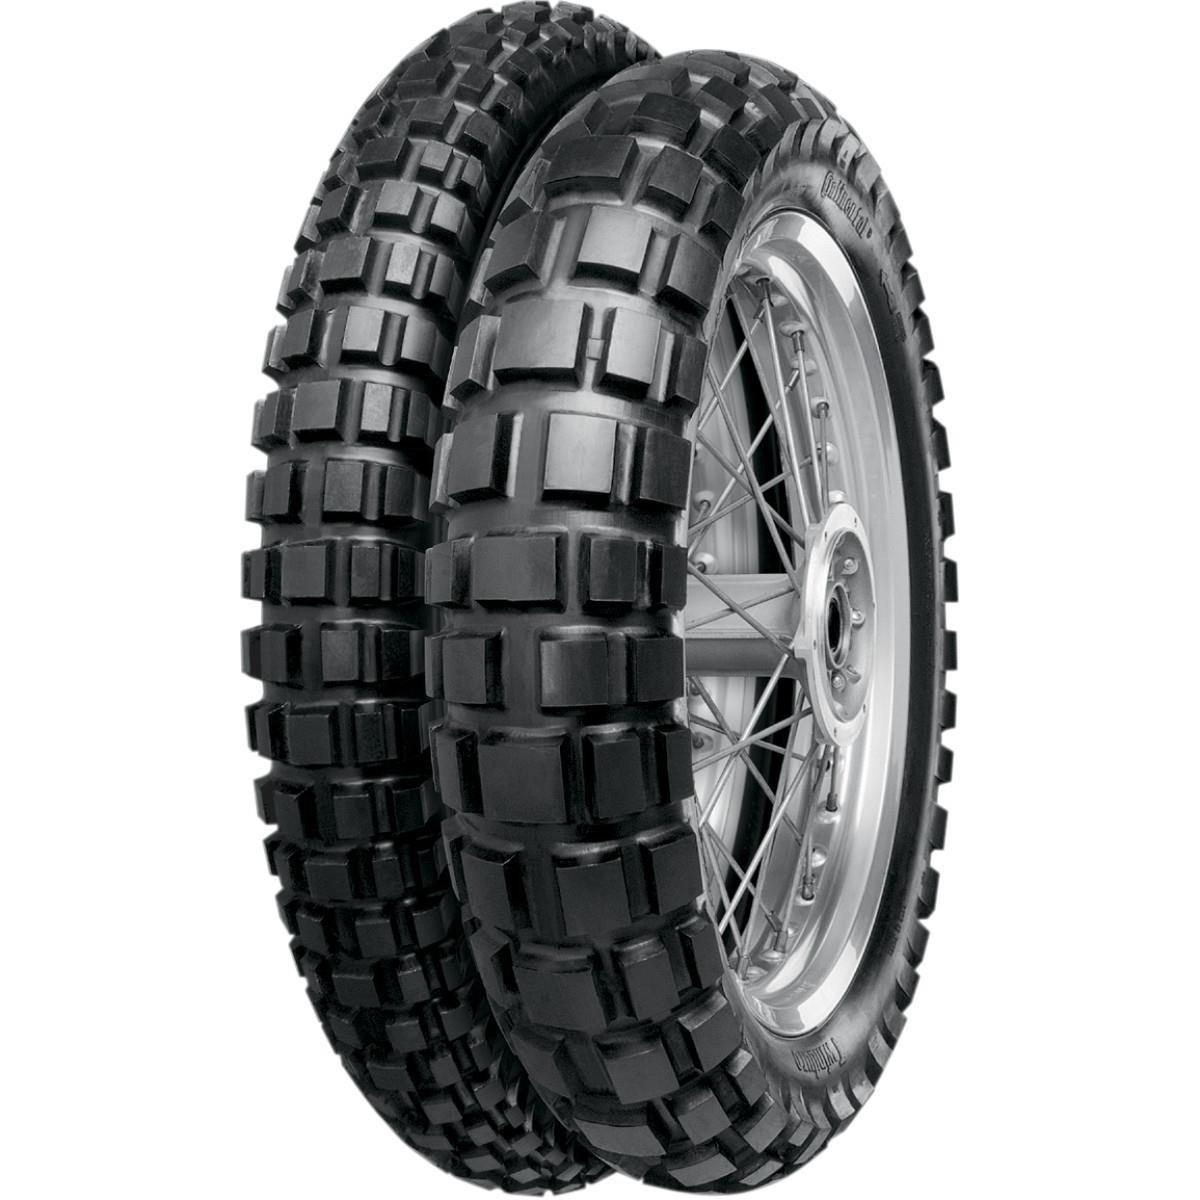 Continental Conti Twinduro TKC80 Dual Sport Tire - Front - 120/70B19 , Position: Front, Rim Size: 19, Tire Application: All-Terrain, Tire Size: 120/70-19, Tire Type: Dual Sport, Tire Construction: Bias 02400830000